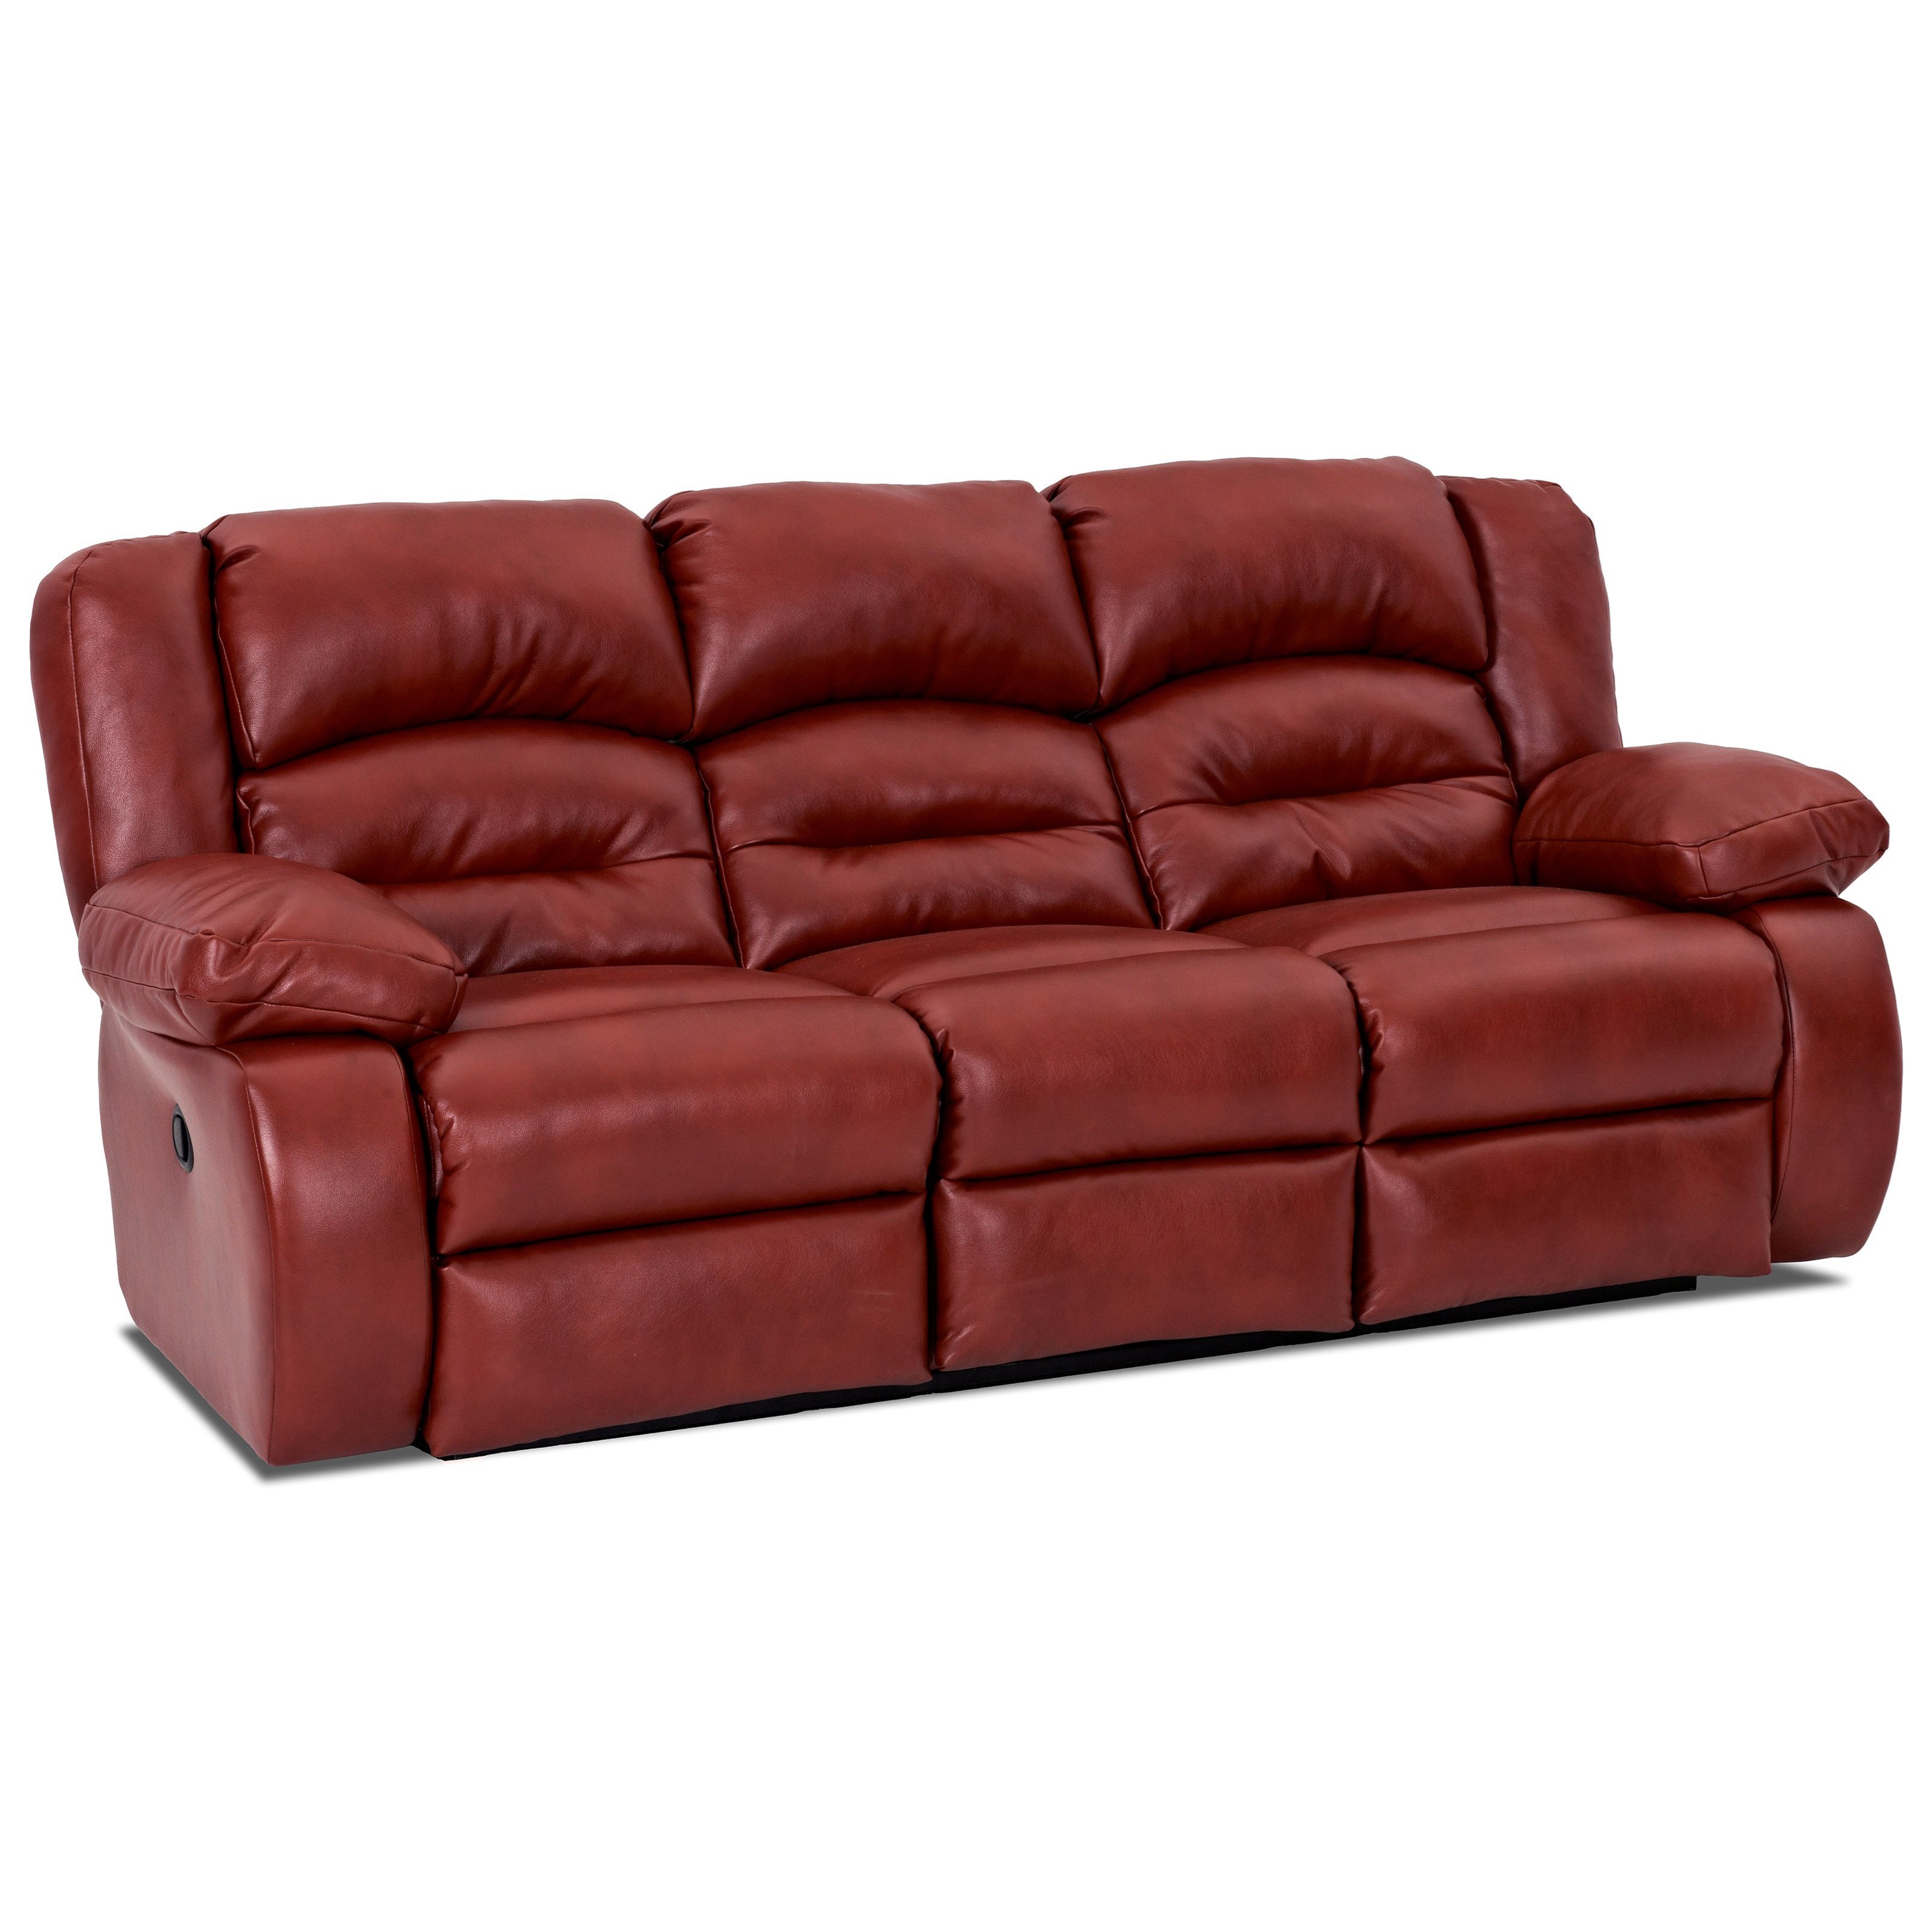 Klaussner austin casual power reclining sofa miskelly for Sofa 3 cuerpos casanova austin